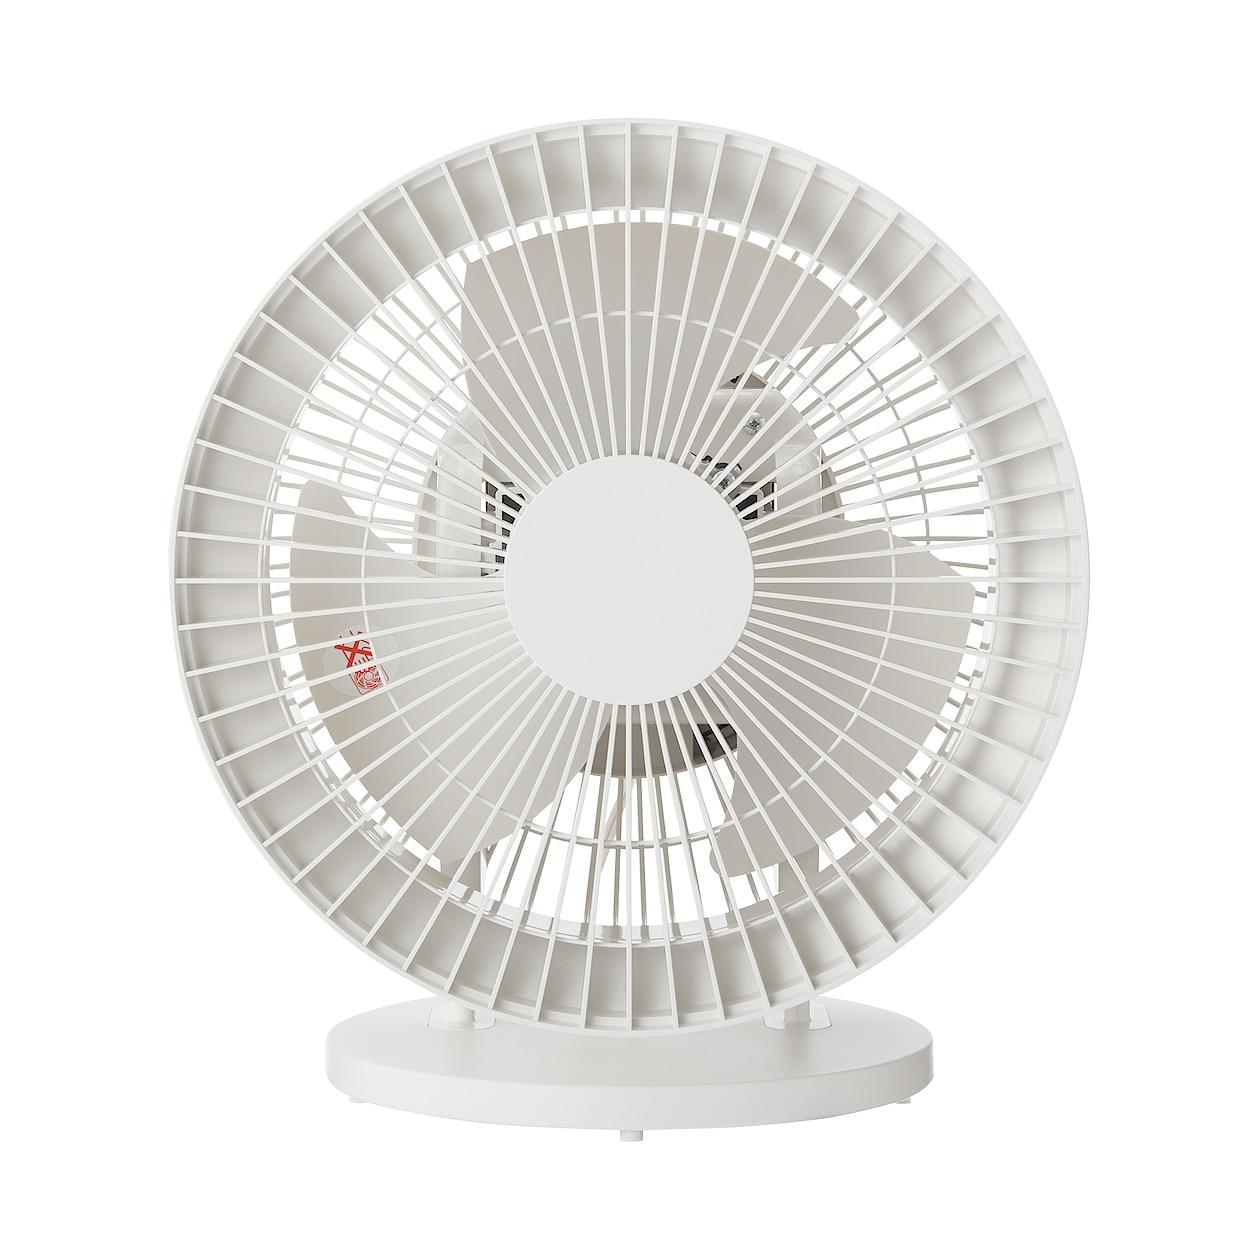 RoomClip商品情報 - サーキュレーター(低騒音ファン・大風量タイプ)・ホワイト